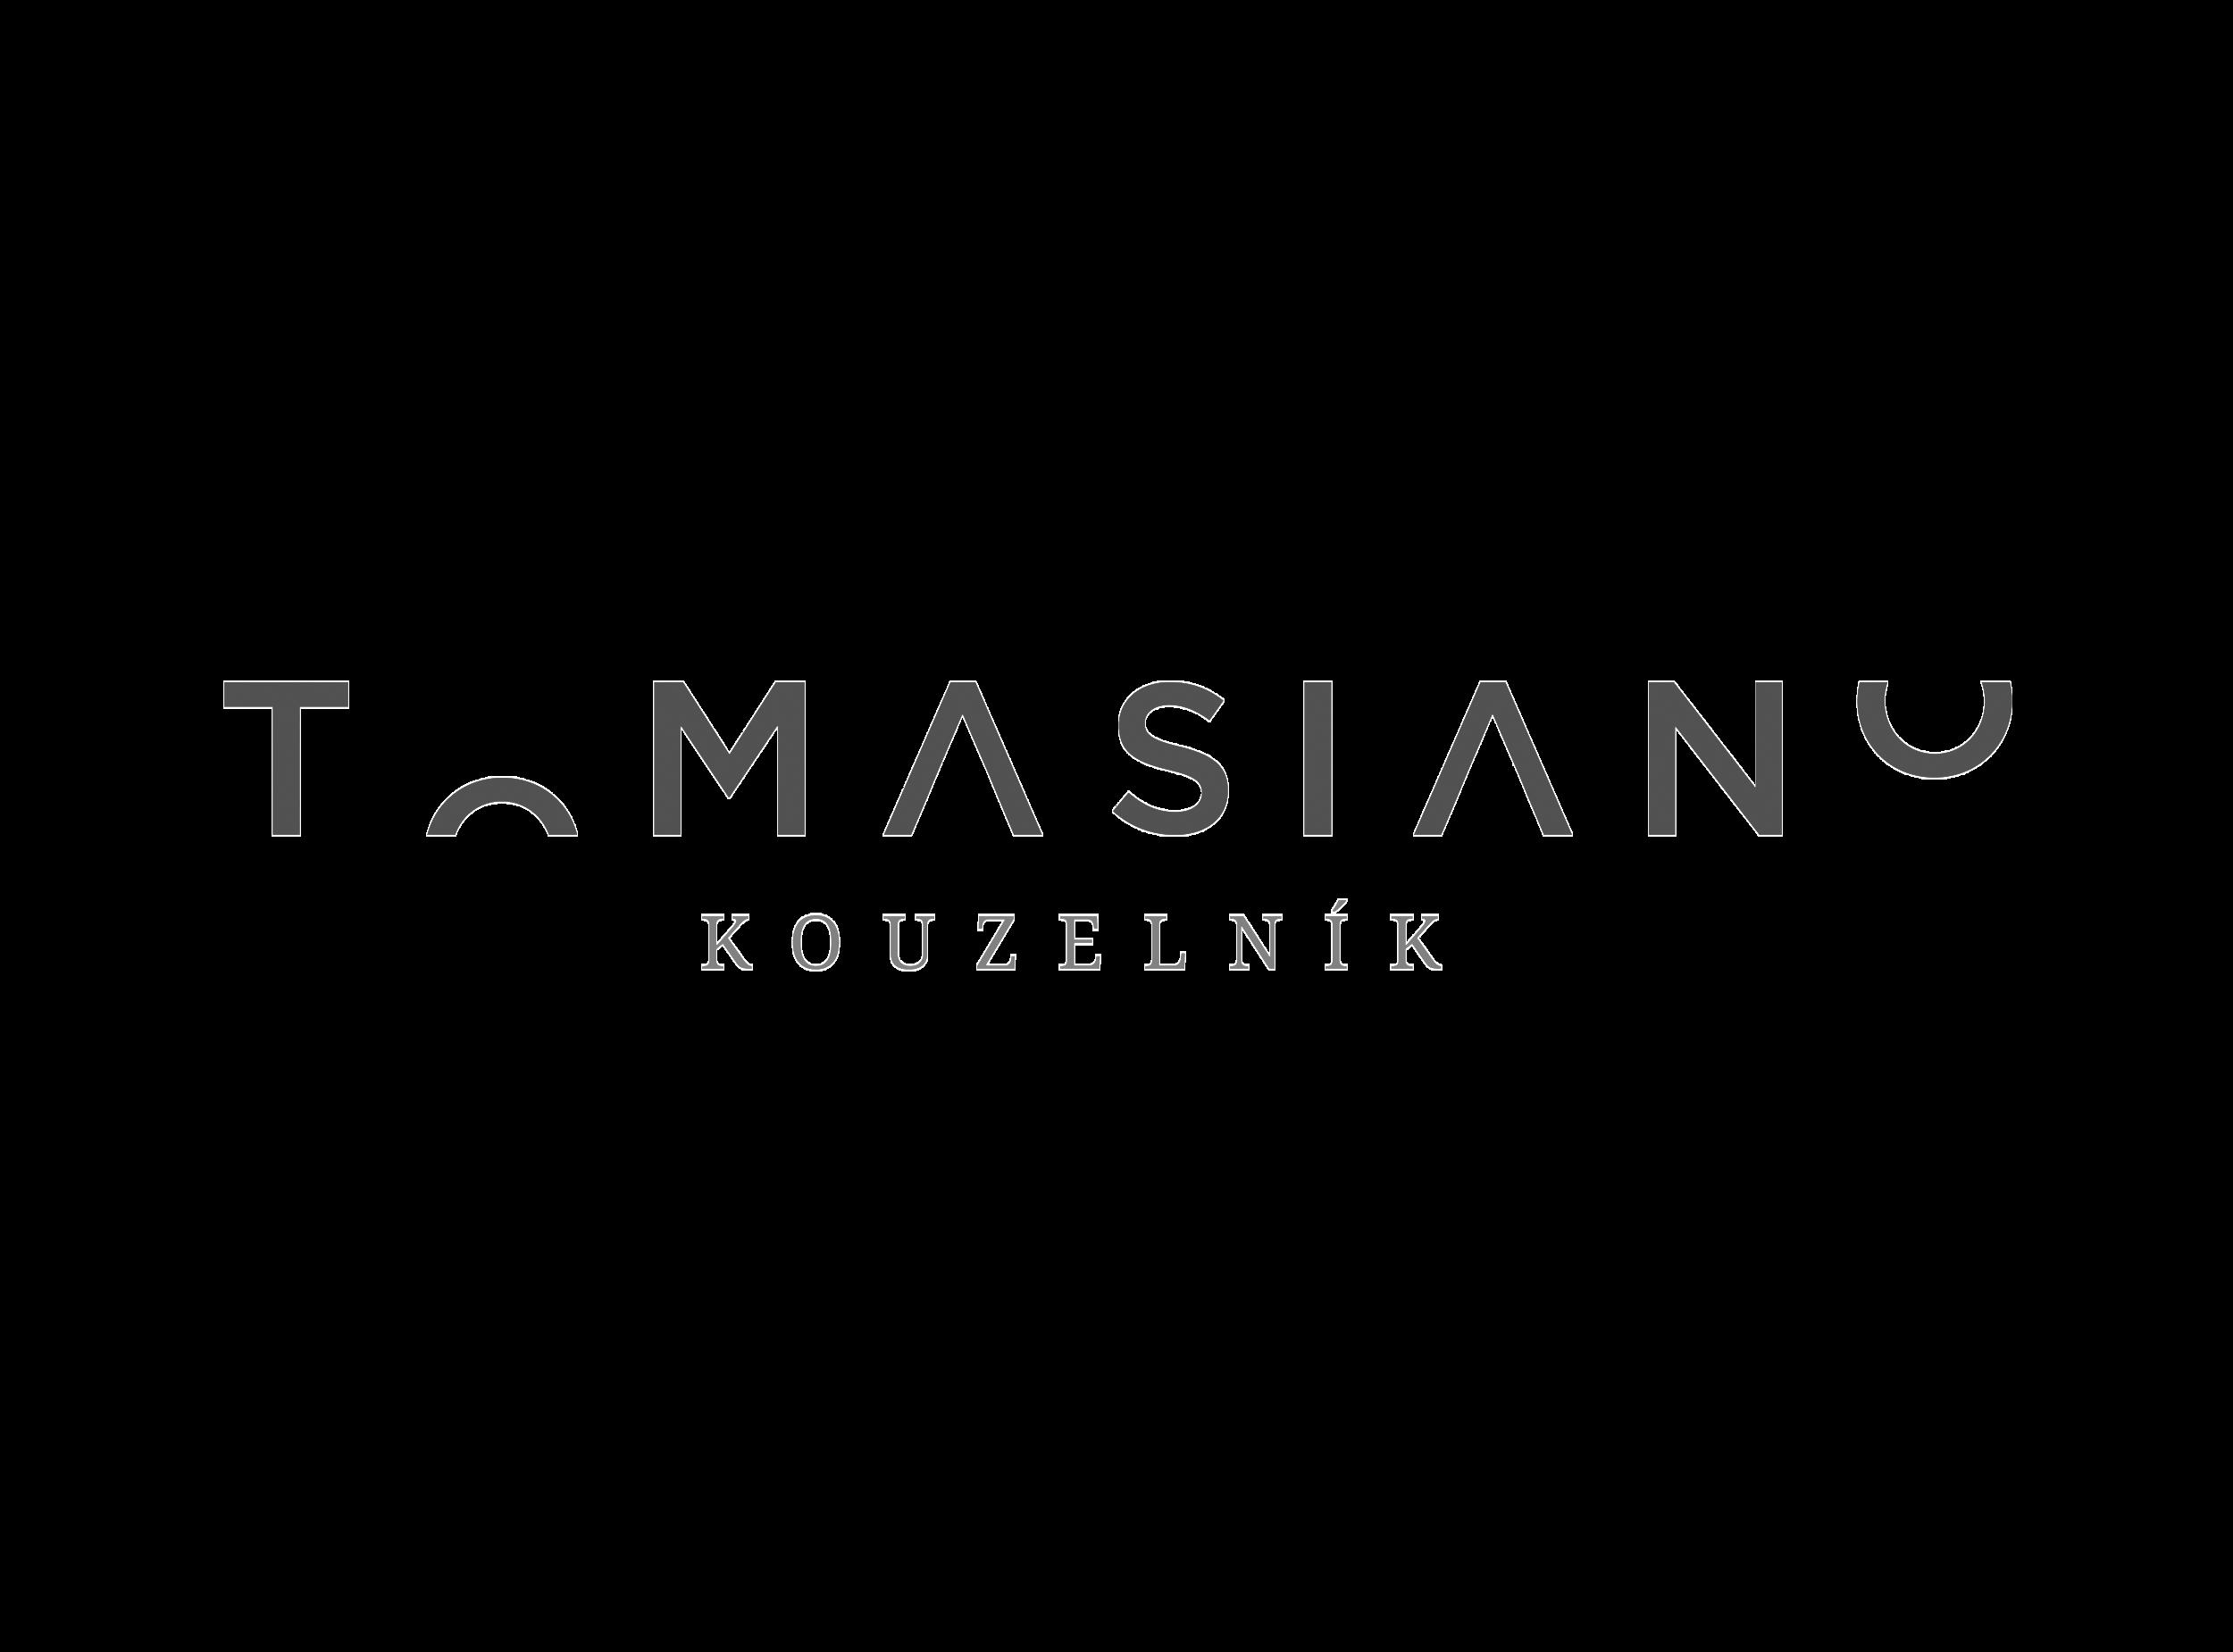 Tomasiano.png